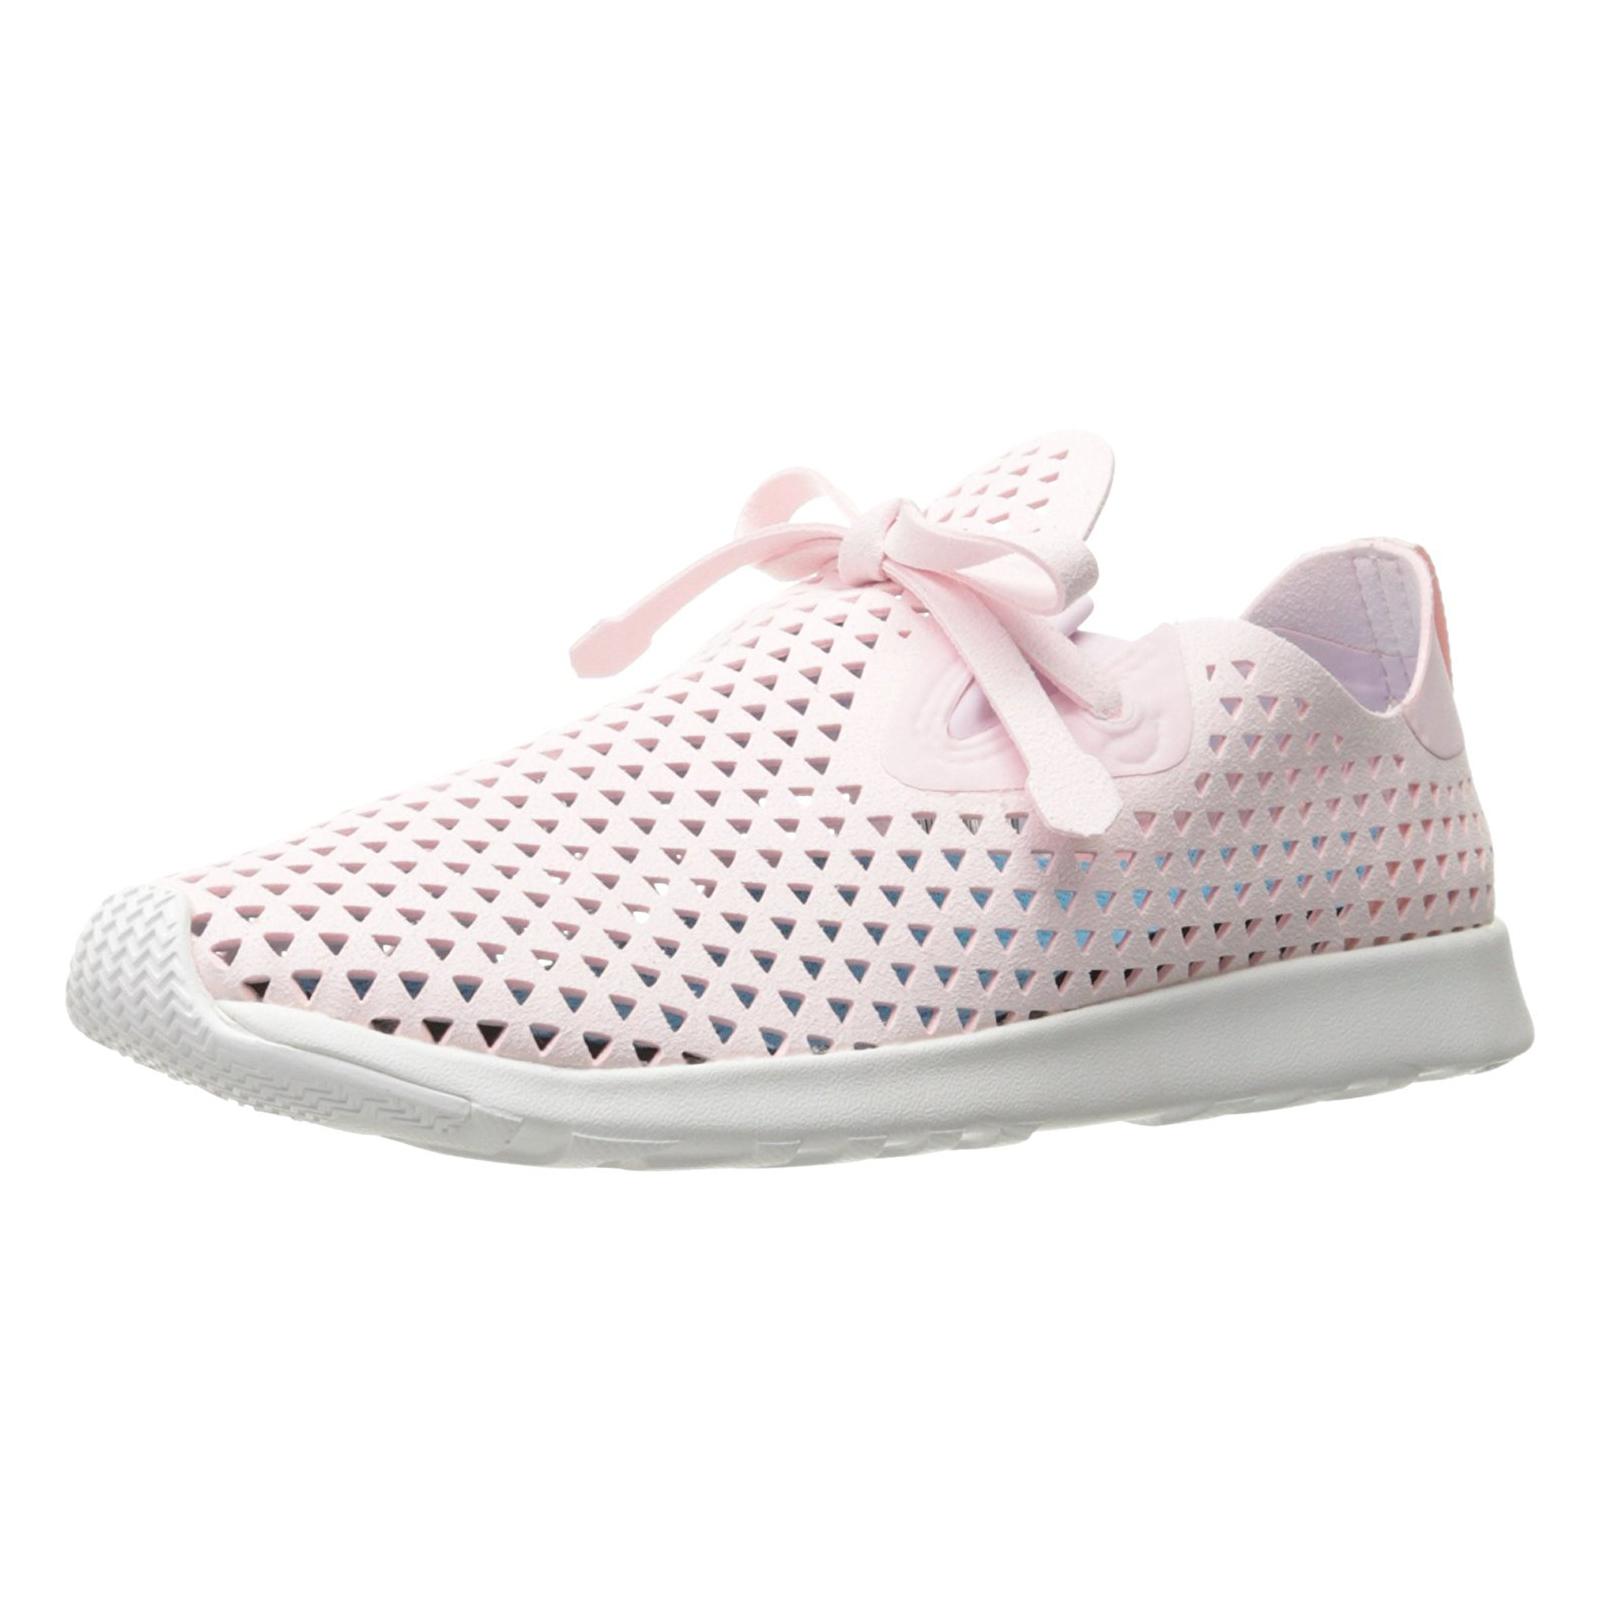 Native Sneakers Apollo Moc Xl Pink   Shell White pink